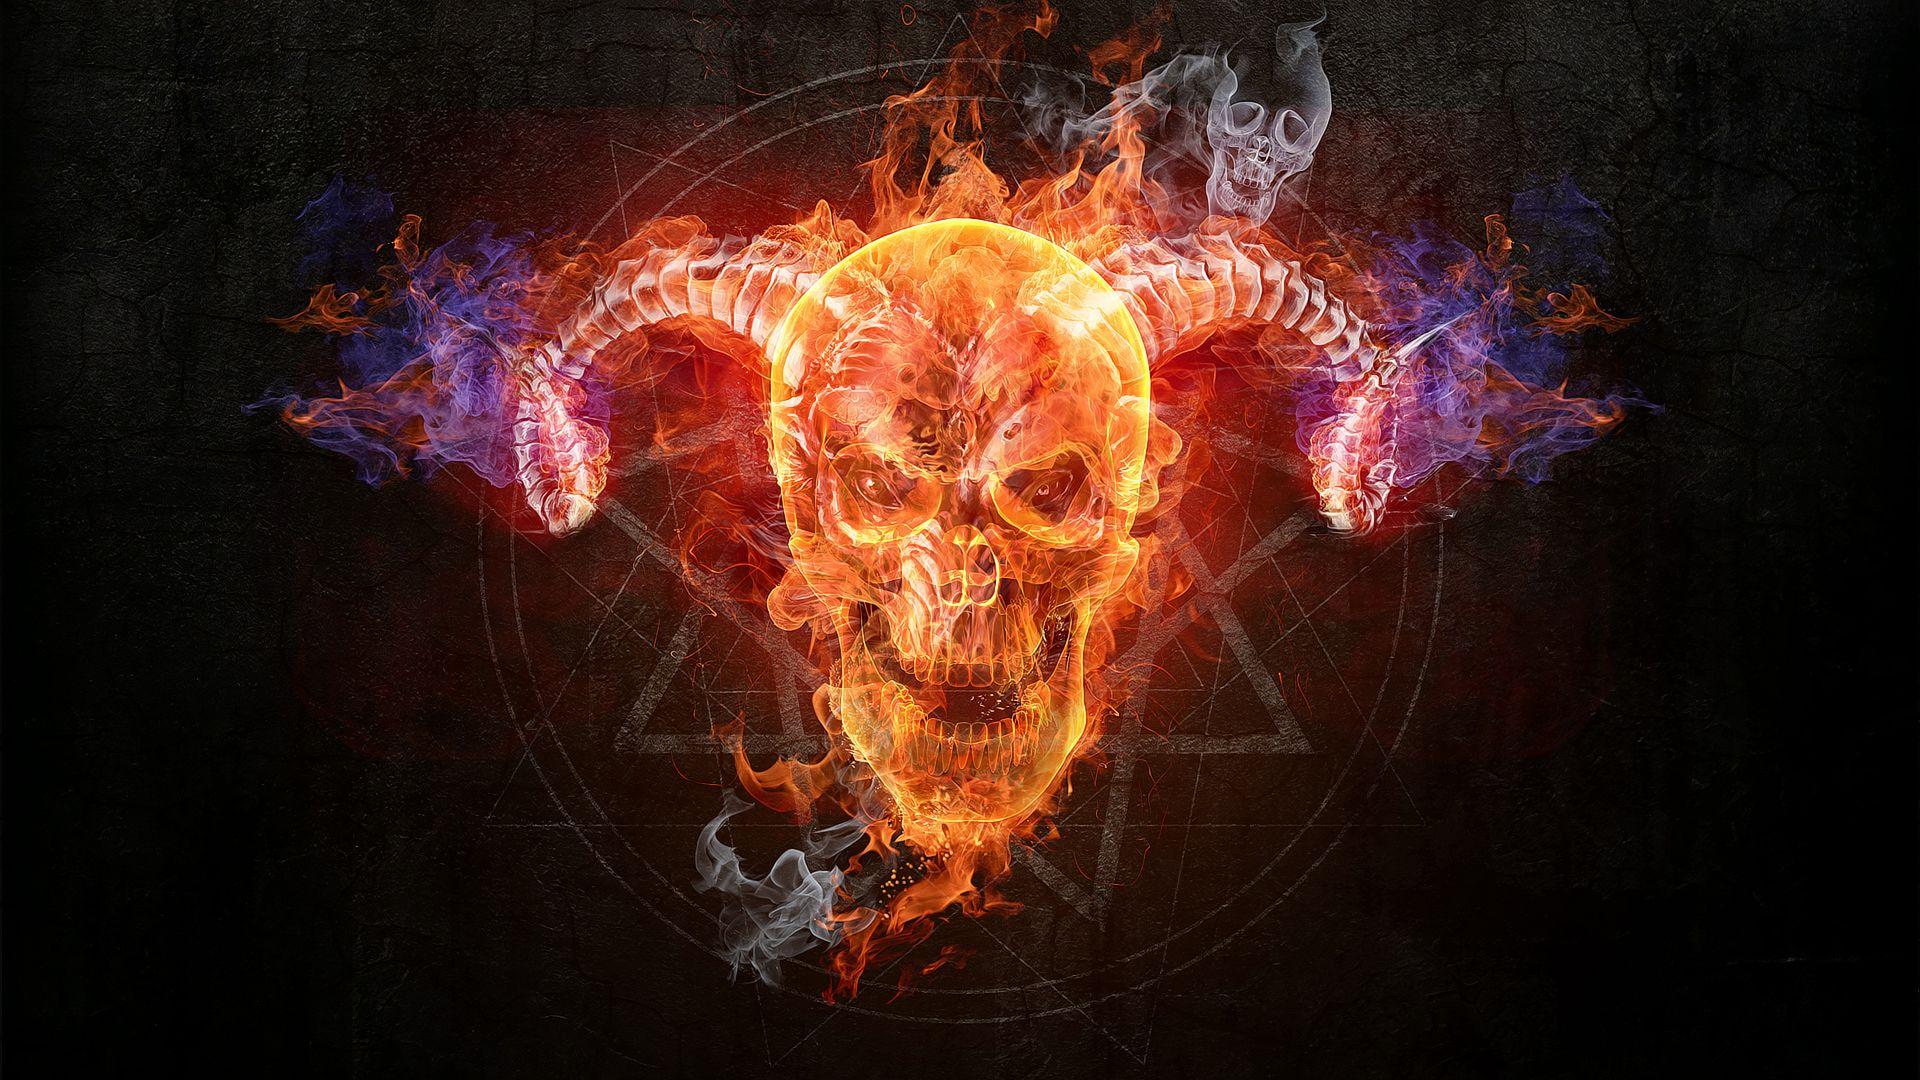 Flaming Skull Wallpaper Free Skull Wallpaper Skull Flame Art